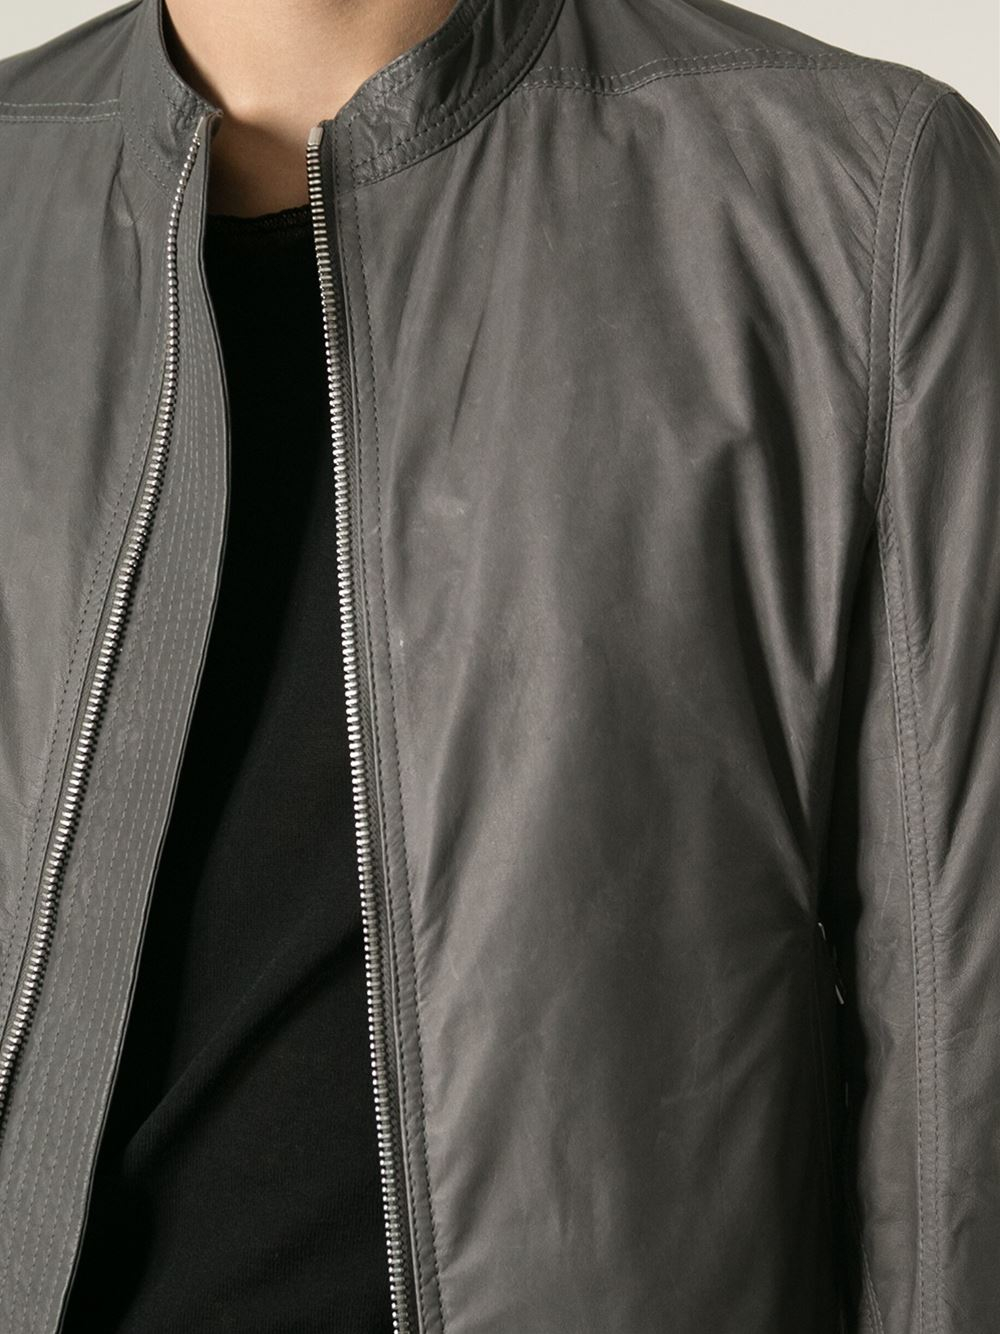 a57e1f34e Rick Owens Gray Kangaroo Leather Jacket for men